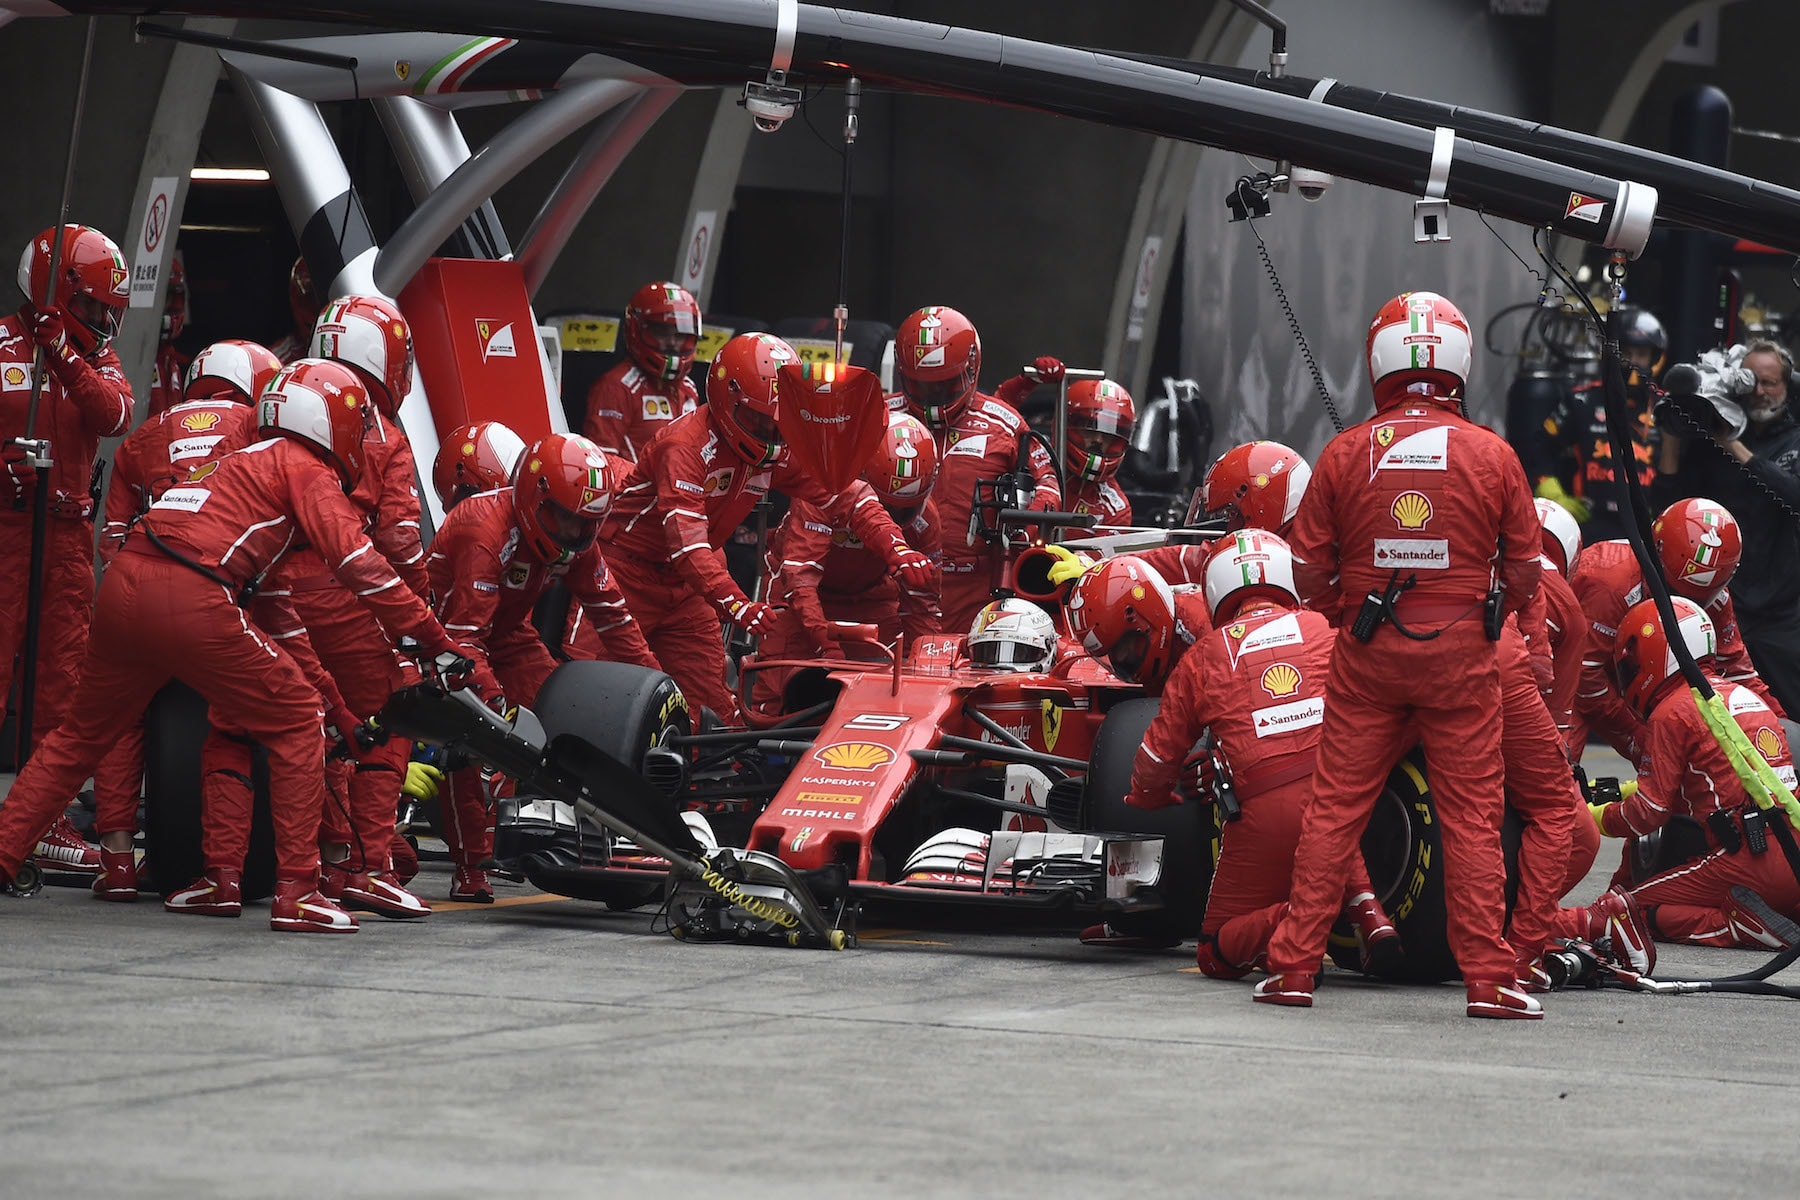 H 2017 Sebastian Vettel | Ferrari SF70H | 2017 Chinese GP P2 3 copy.jpg